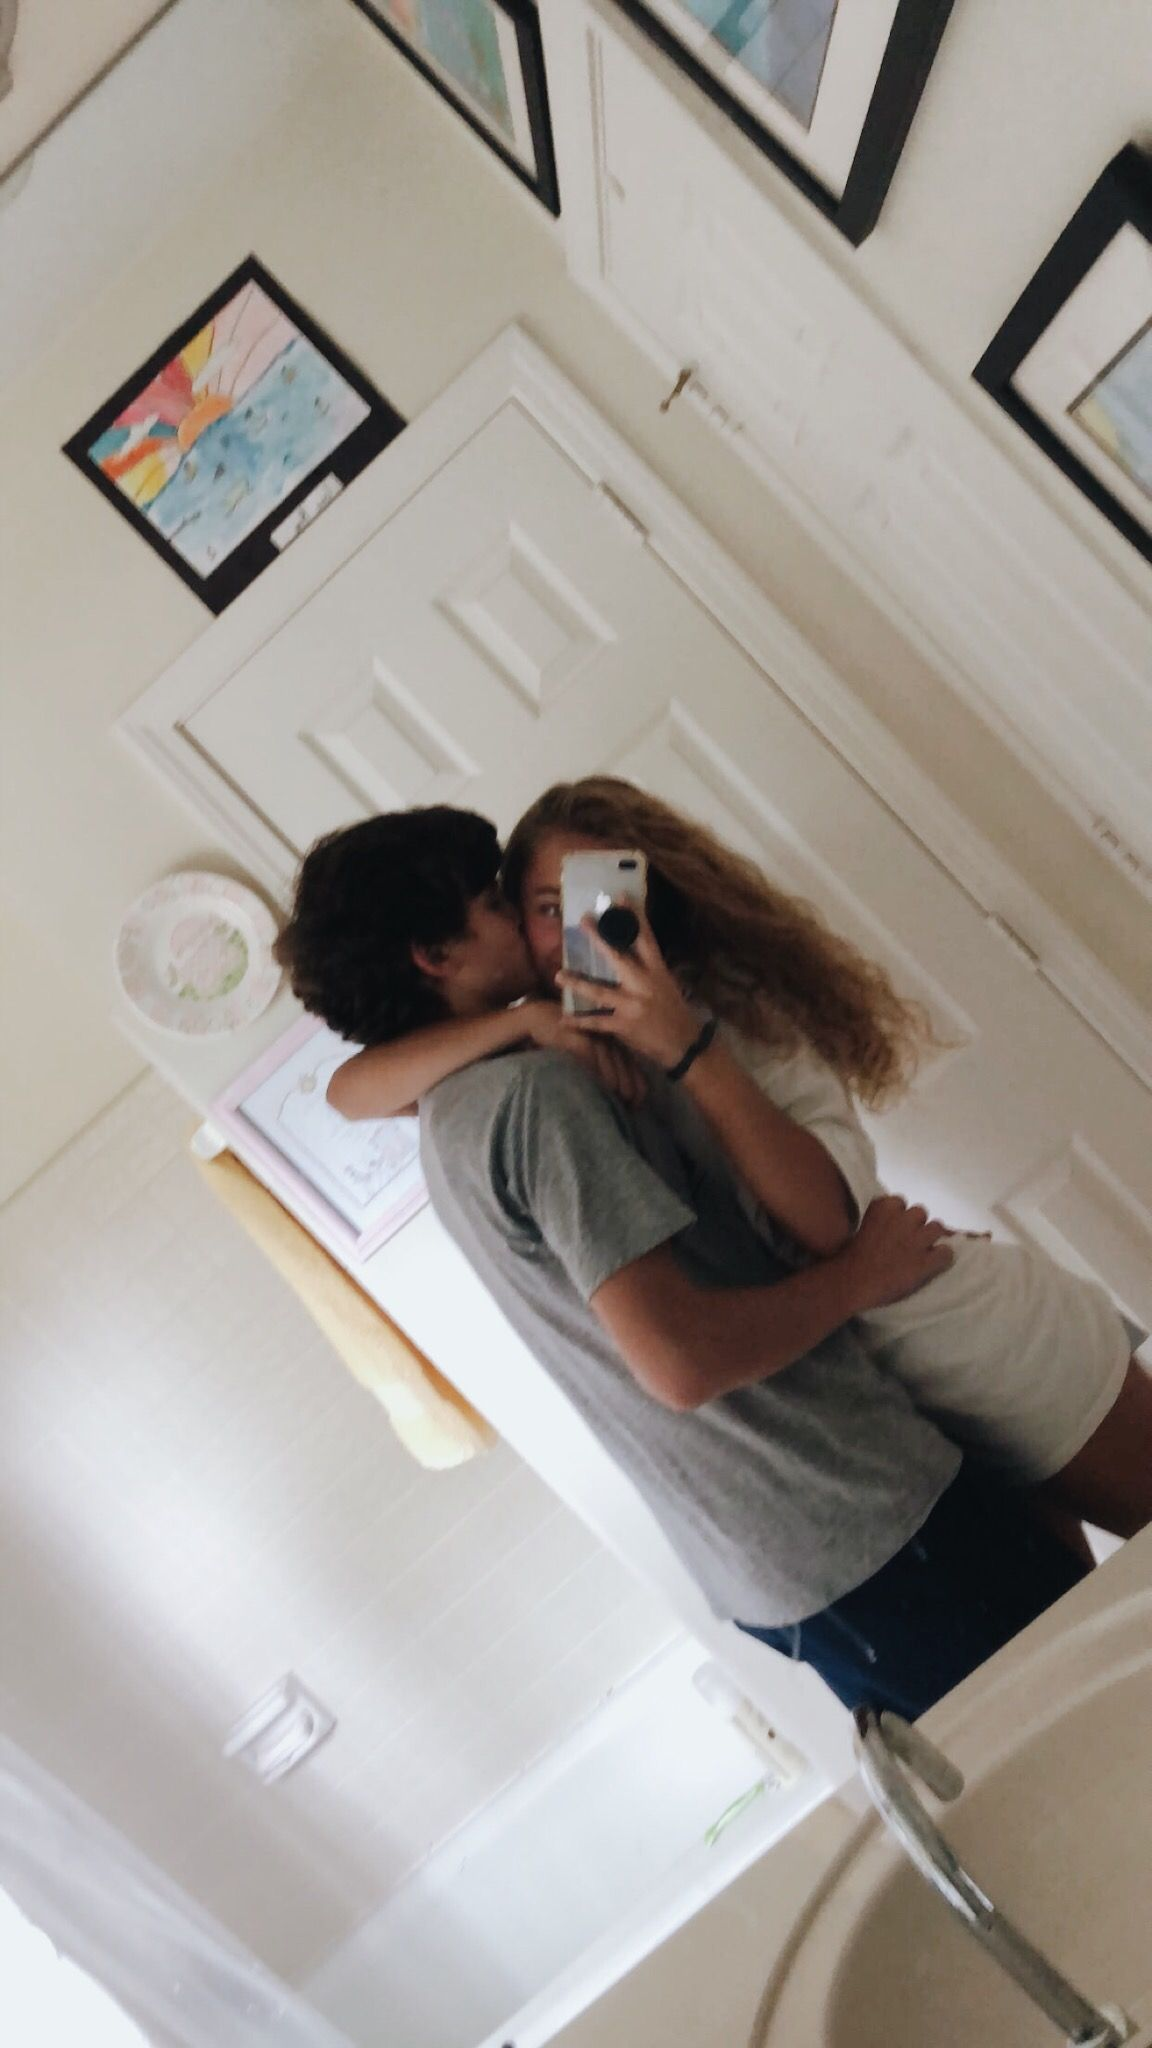 Pin Juliatops Vsco Juliatops Couple Goals Teenagers Cute Couples Goals Couple Goals Relationships